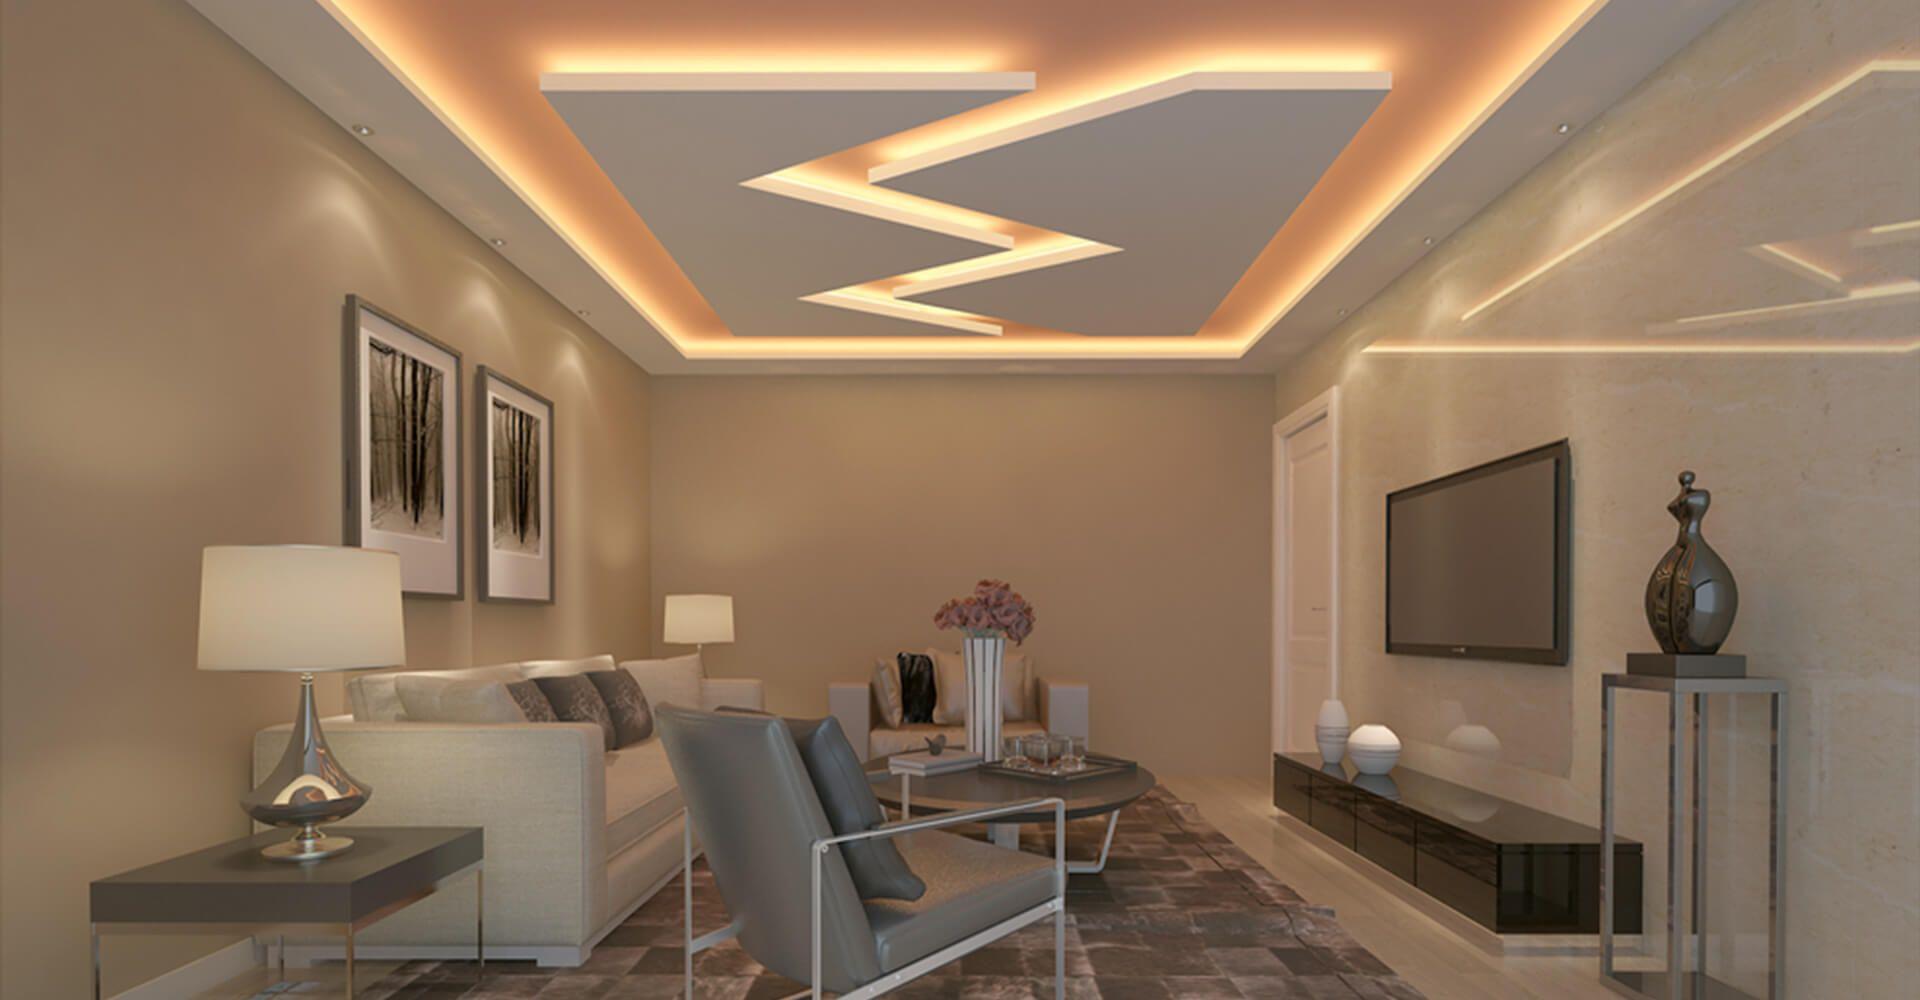 Moderne Wohnzimmer Decke Design Ideen #Badezimmer  False ceiling